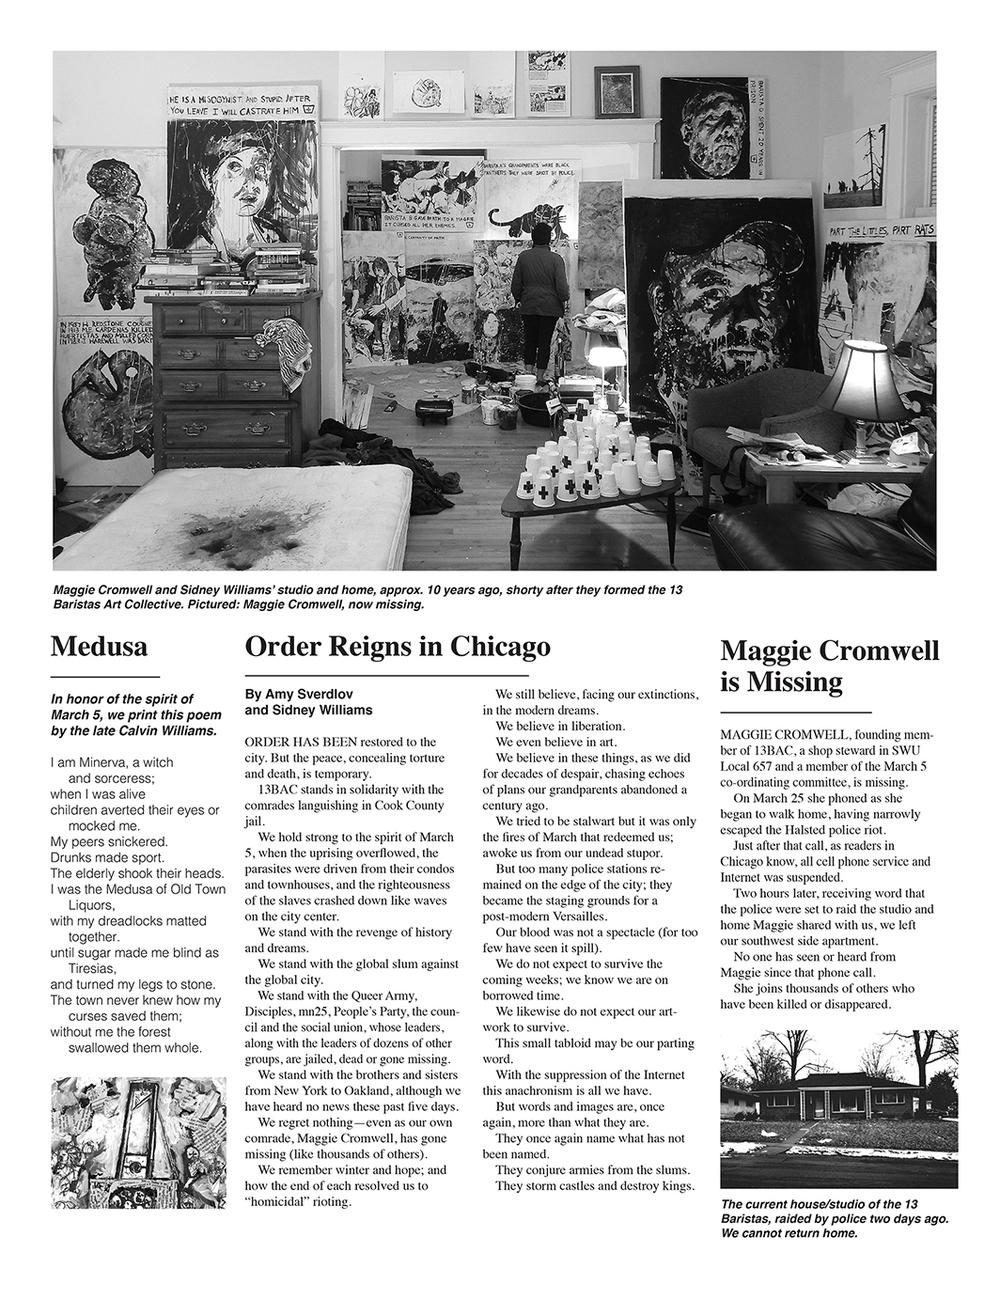 13 Baristas newspaper detail (2015)